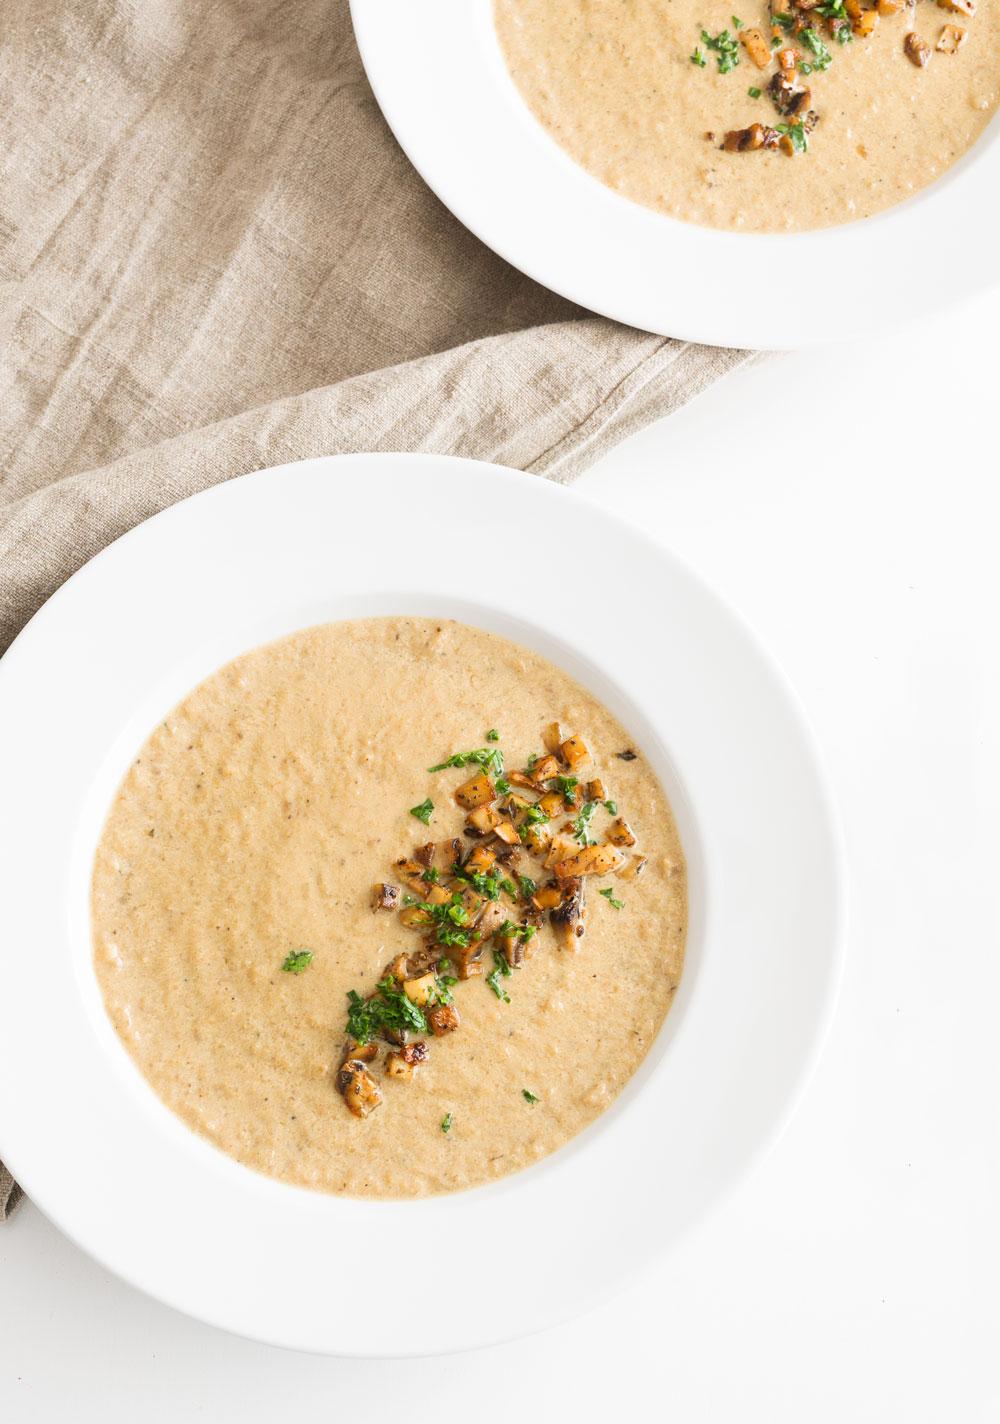 Creamy Mushroom and Cauliflower Soup - Minimally Invasive